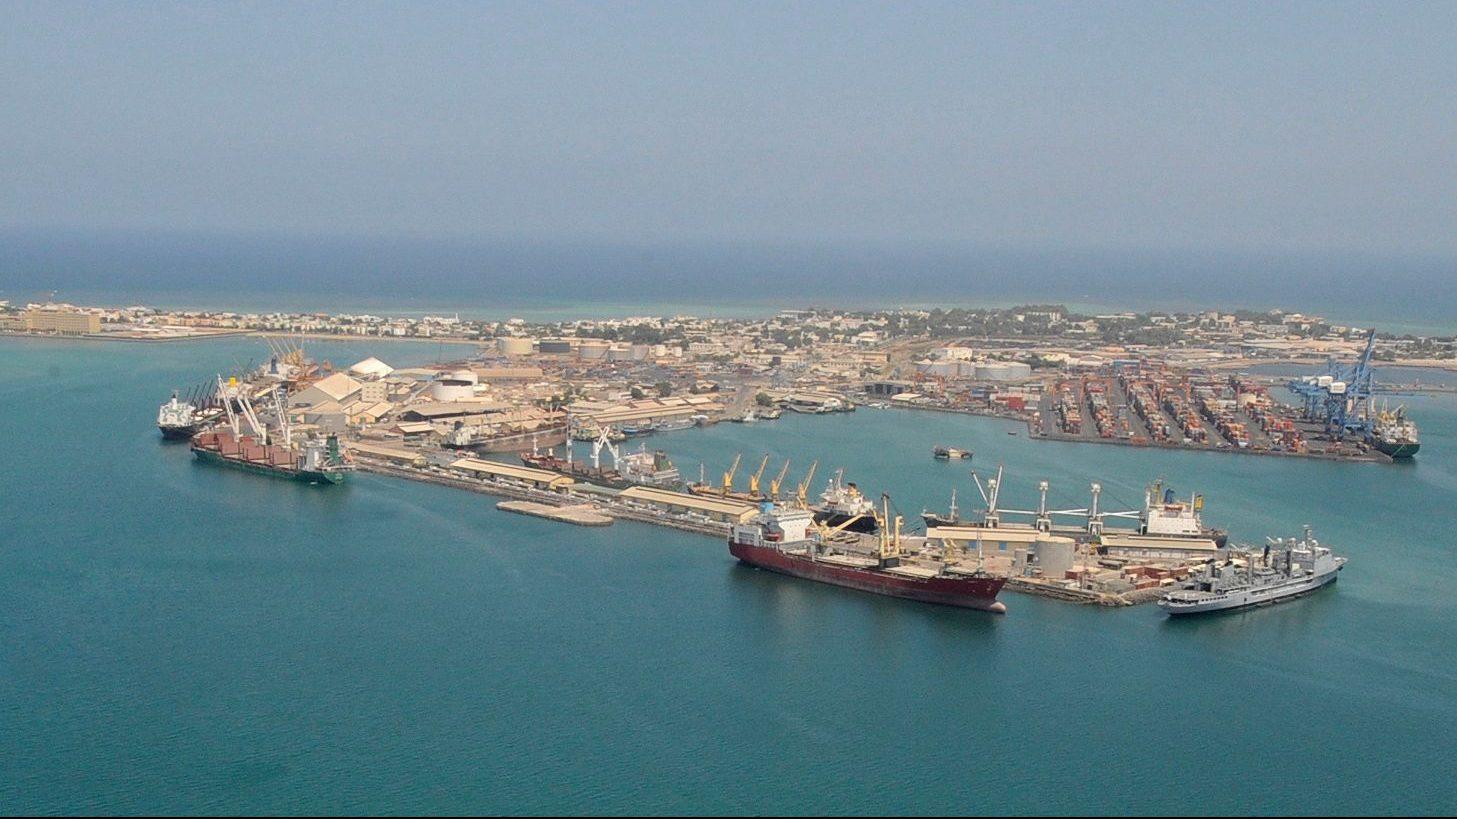 Ethiopia's Djibouti-Somaliland ports power dynamics in horn